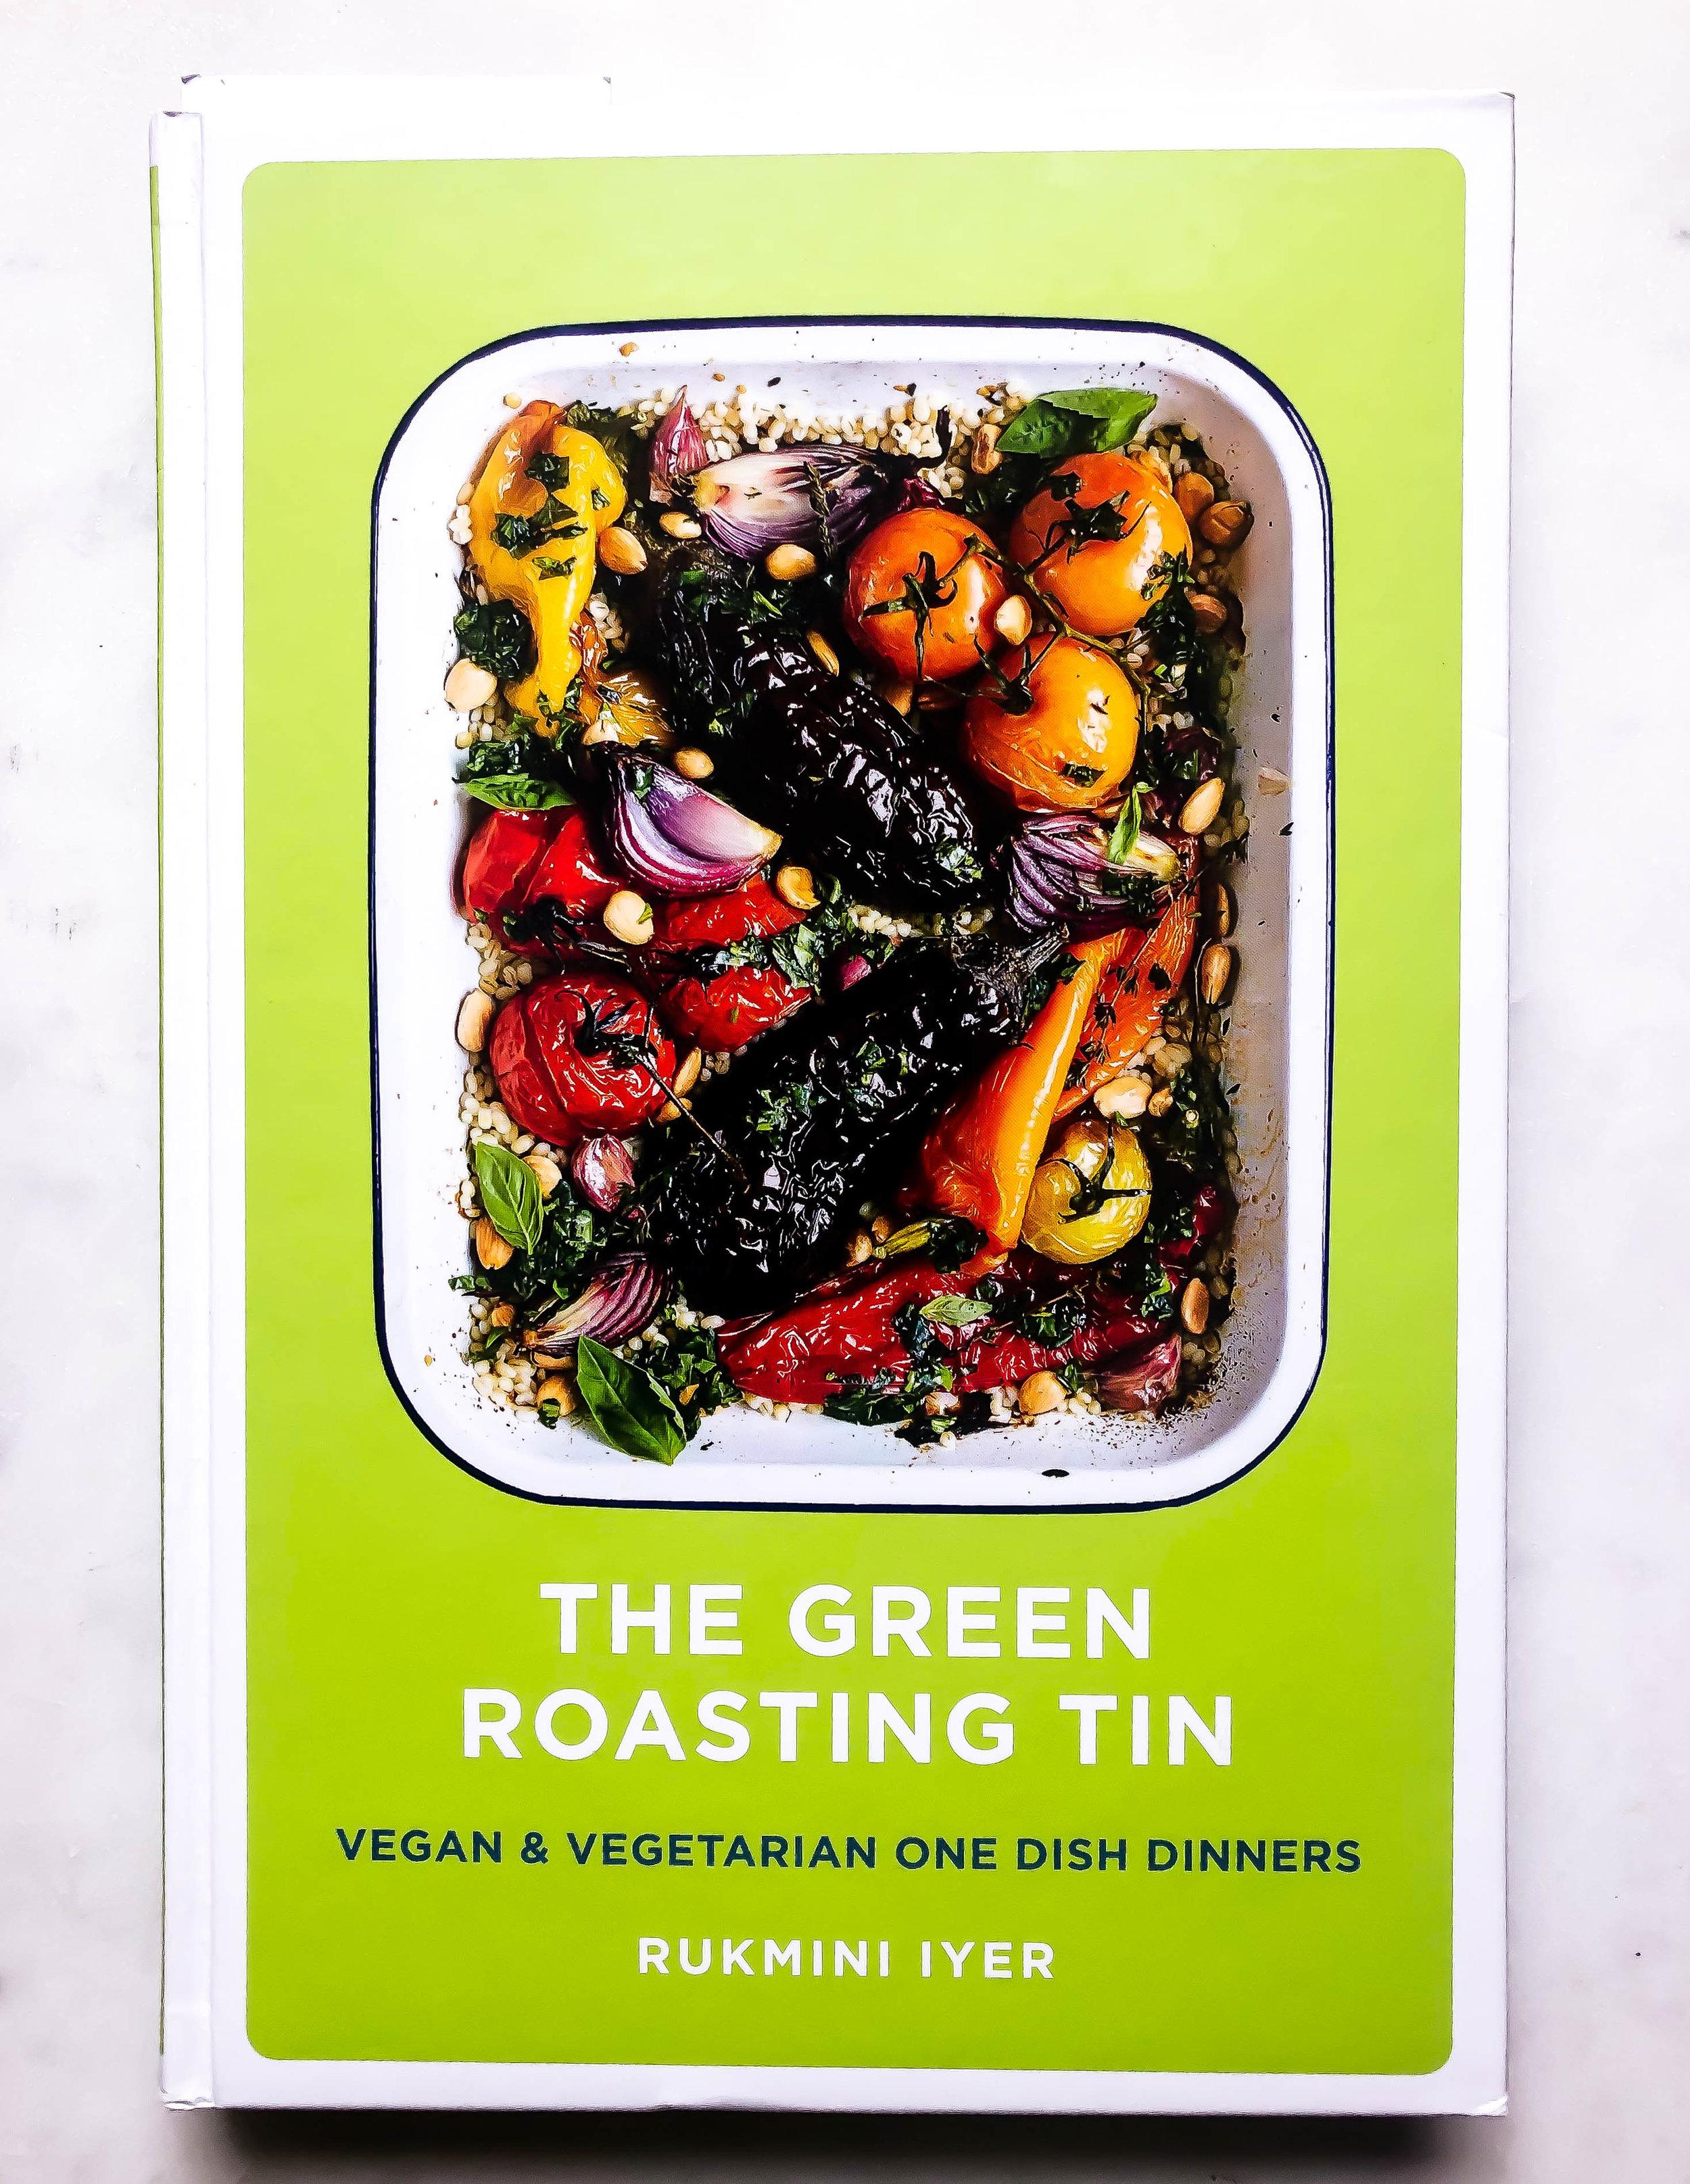 The Green Roasting Tin Cookbook